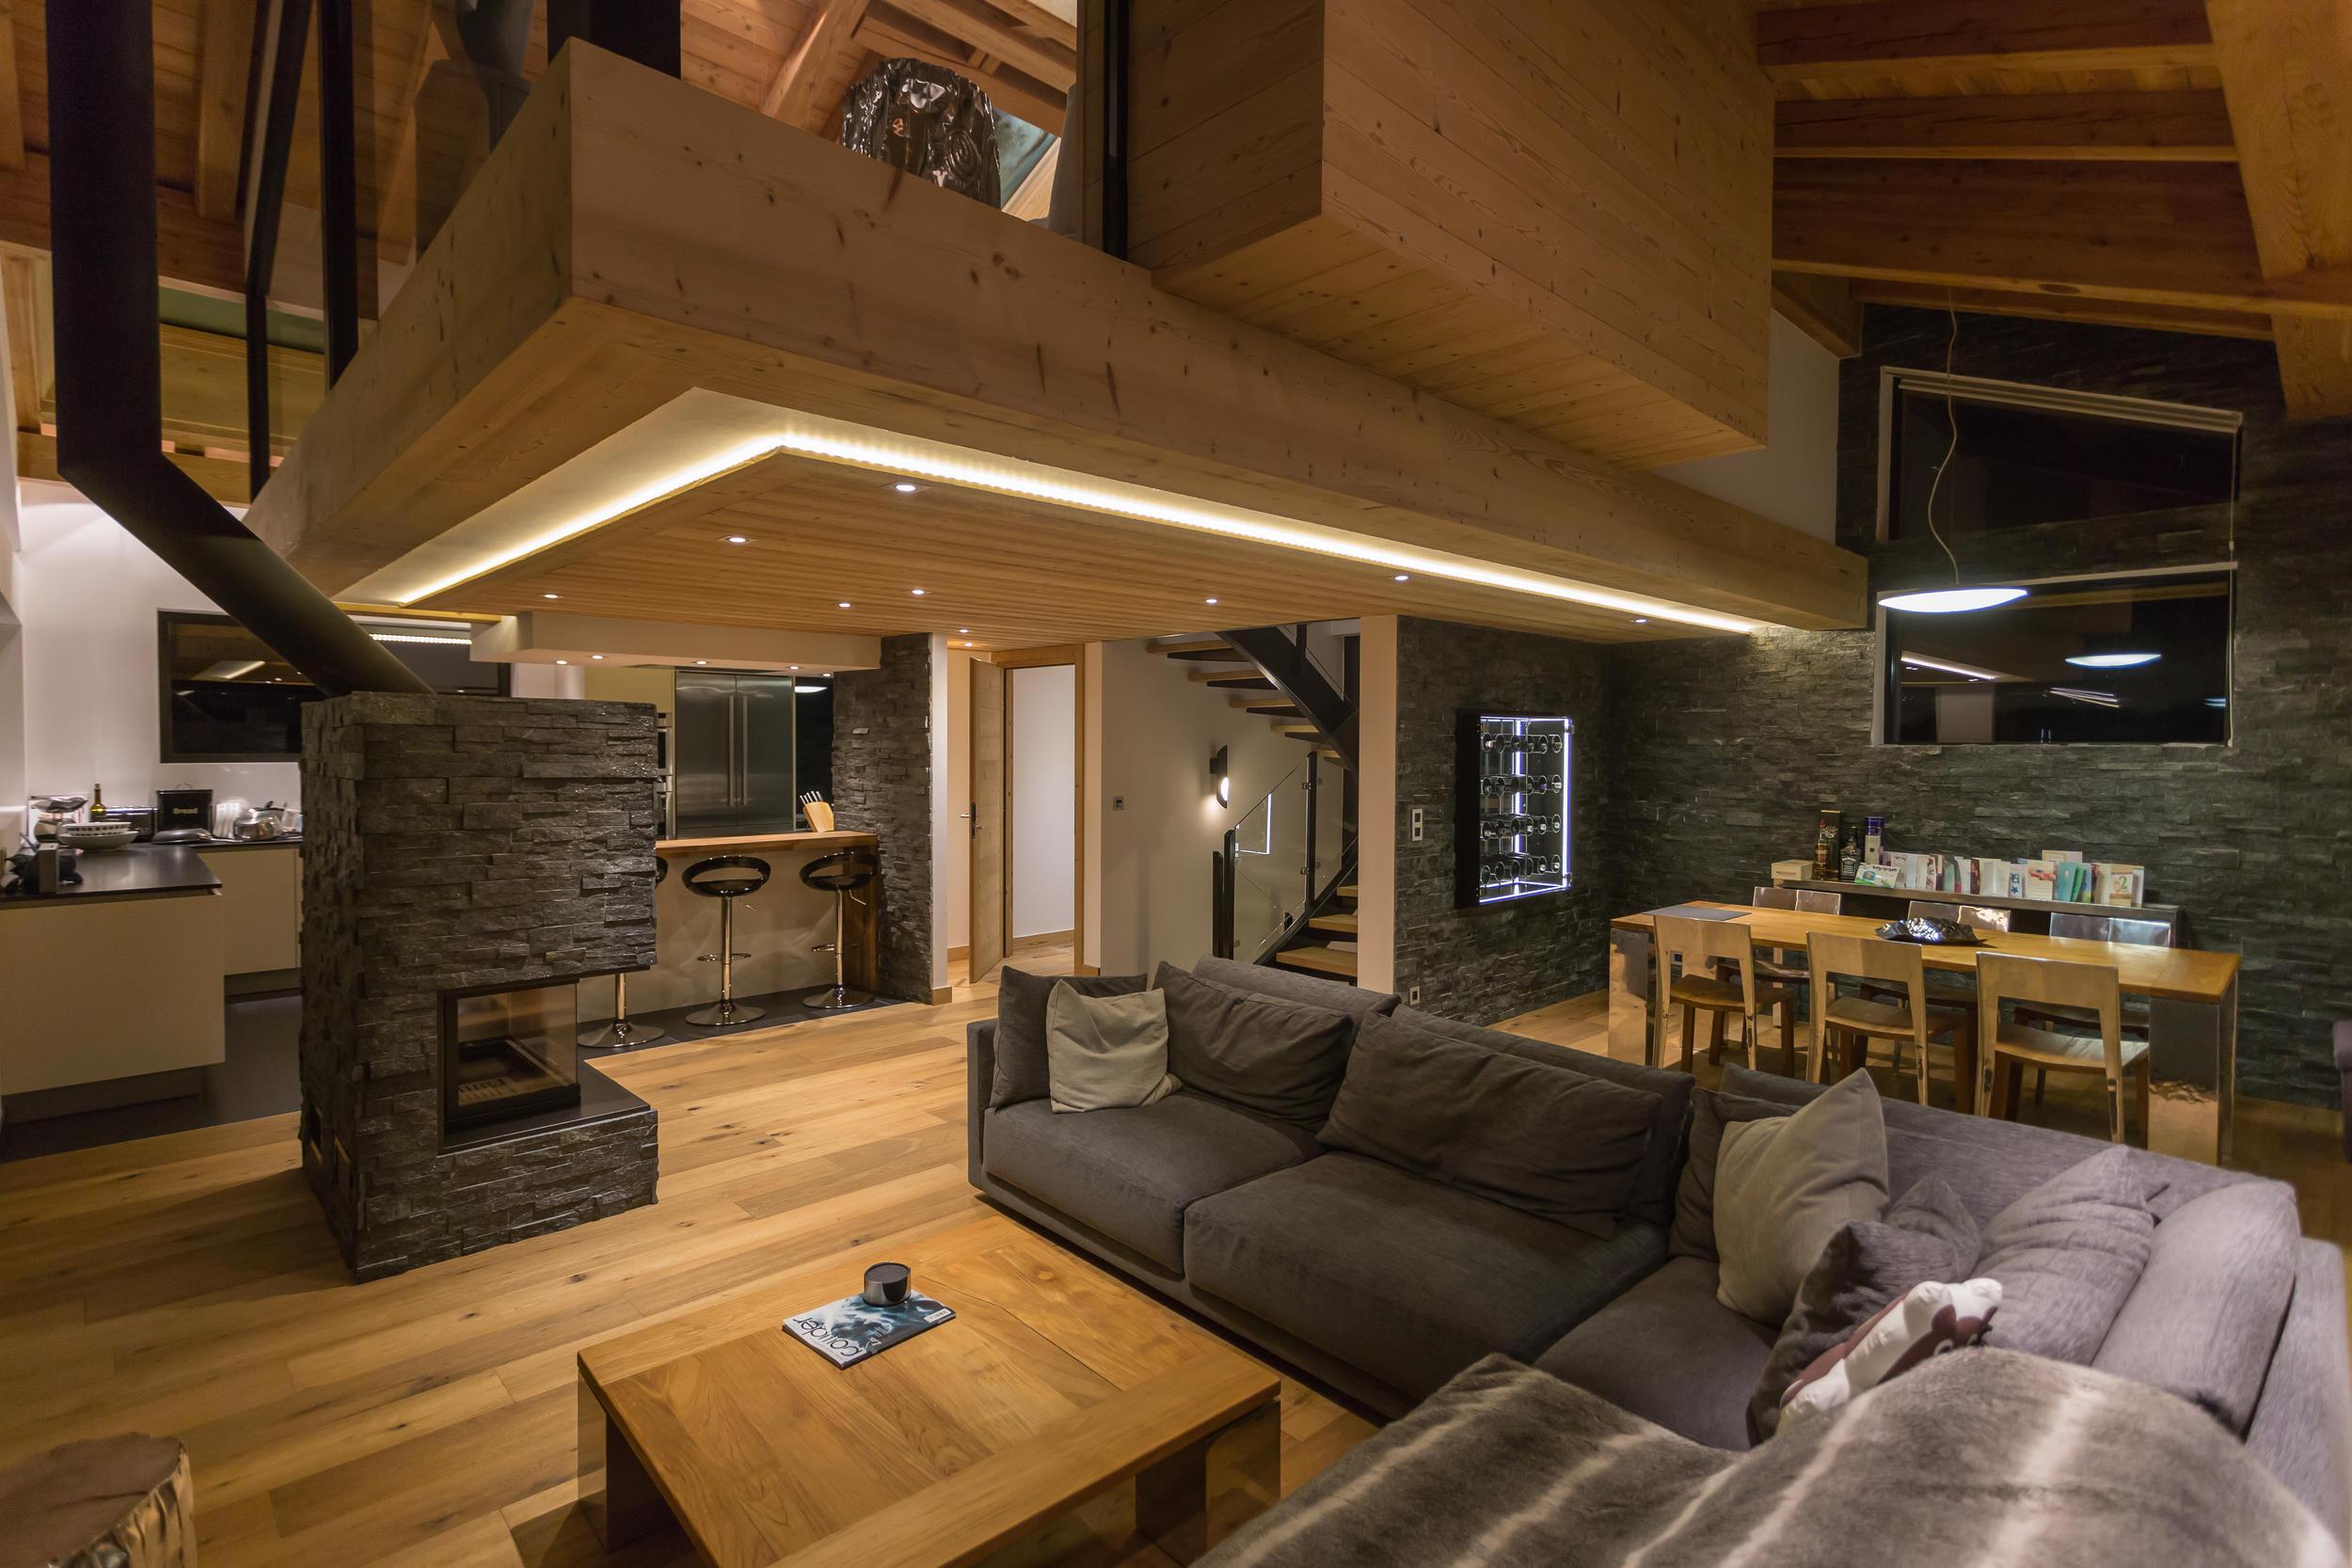 http://chevallier-architectes.fr/content/uploads/2016/05/ALPEN__69_sur_89_-450x450.jpg